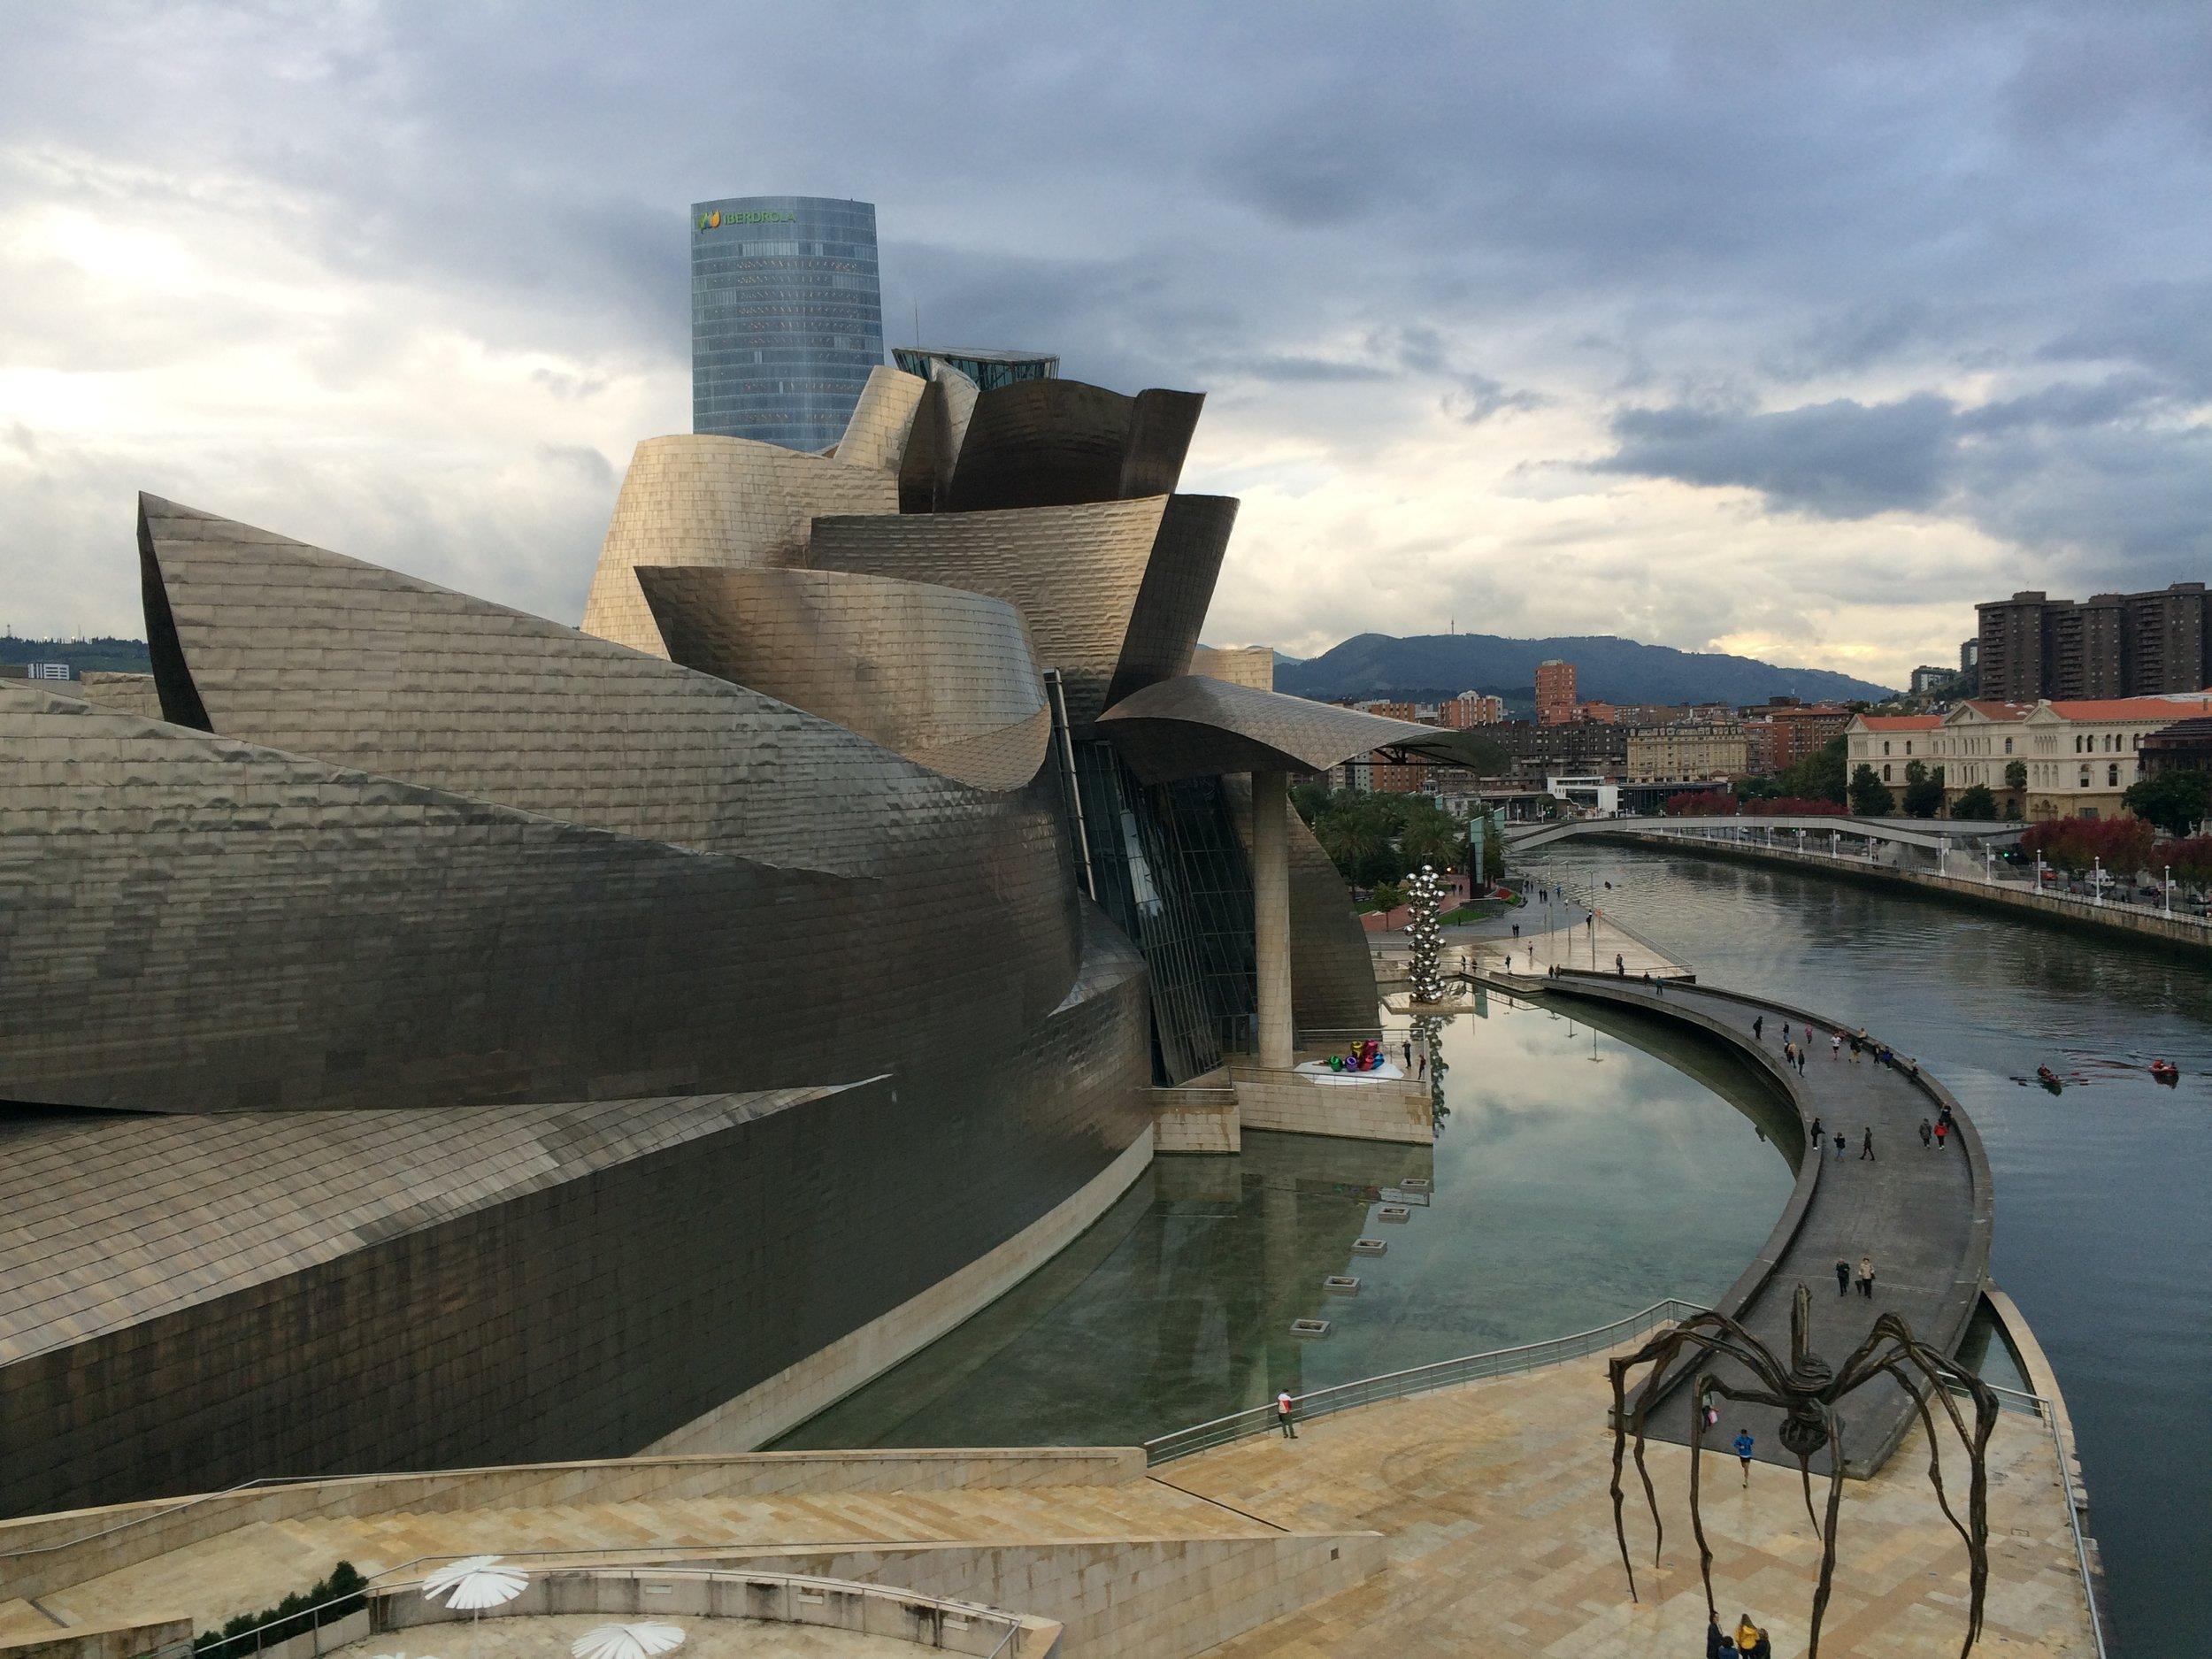 Guggenheim and Arana (spider)